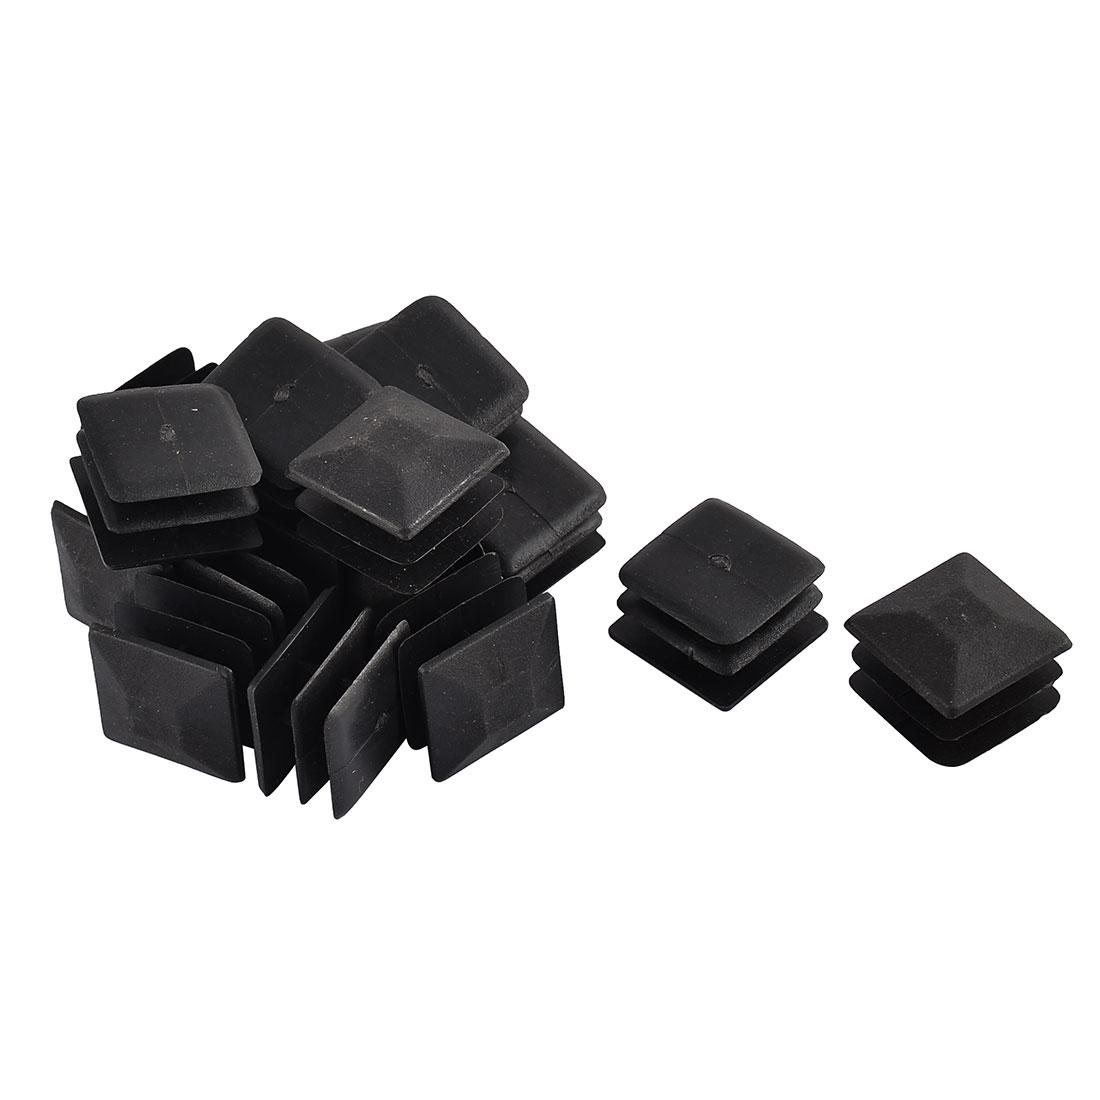 Home Desk Chair Plastic Square Blanking End Cap Tube Insert Black 20x20mm 16pcs